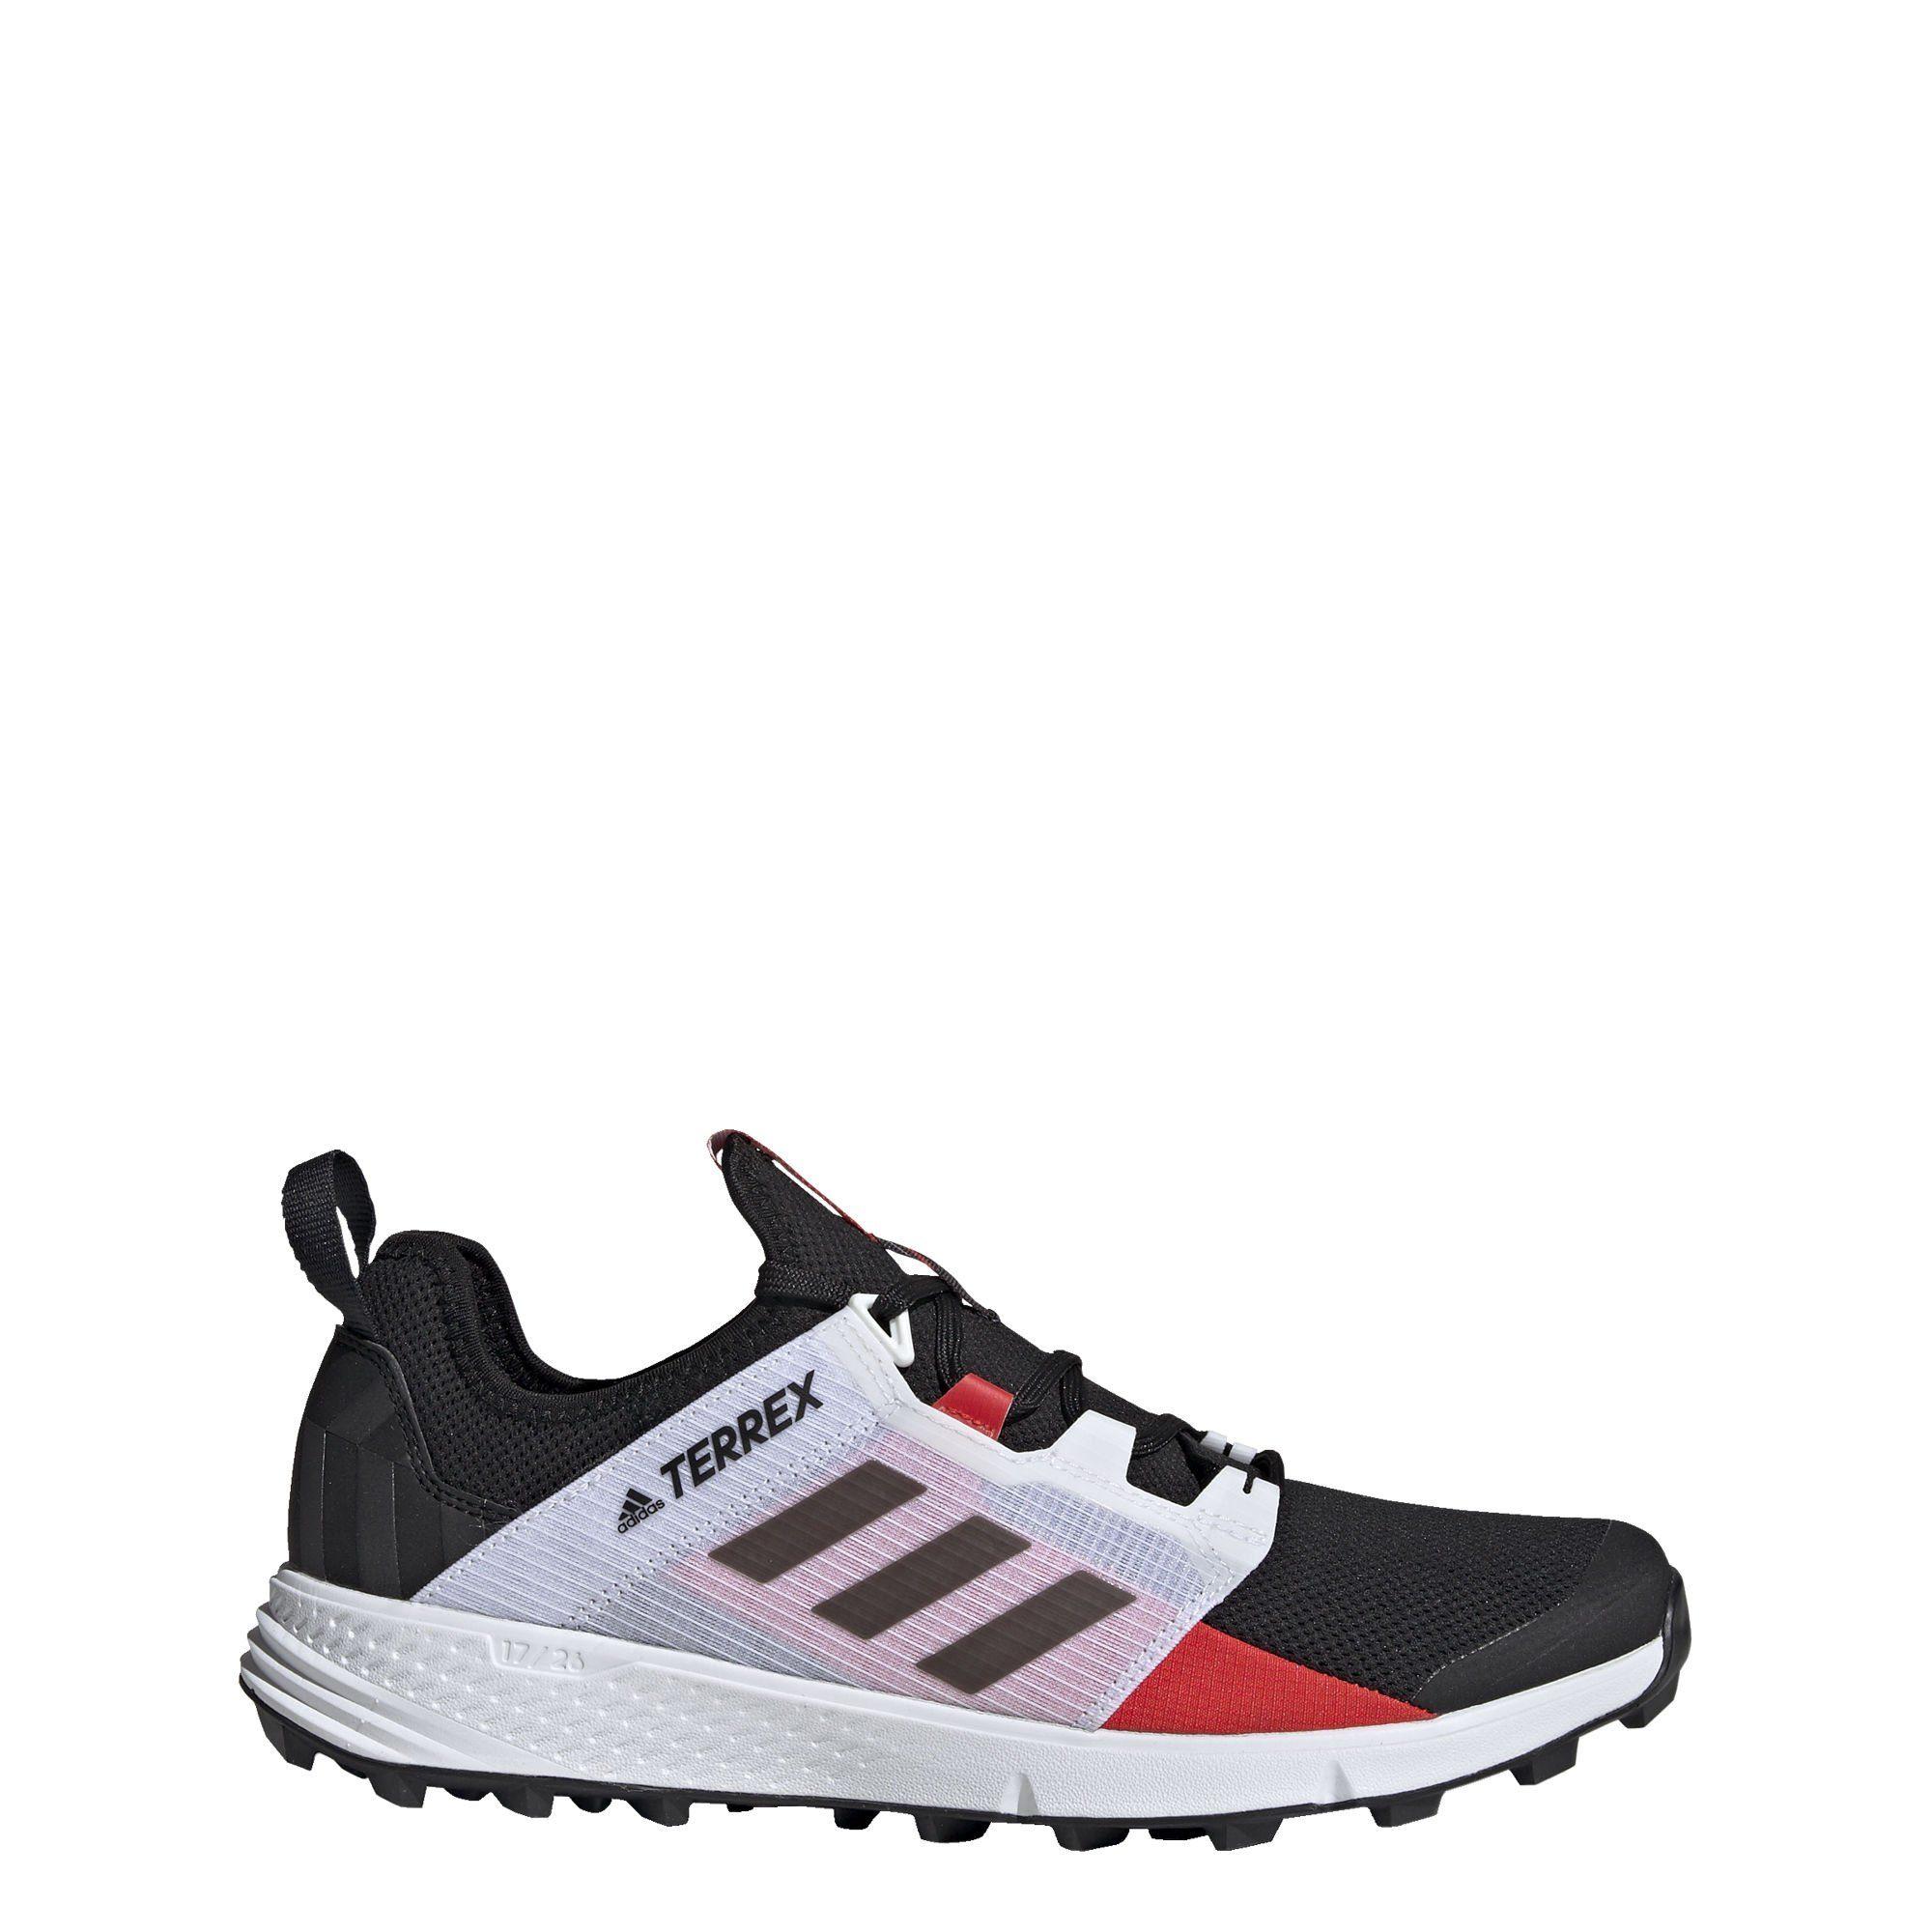 adidas Performance »TERREX Speed LD Schuh« Outdoorschuh Outdoorschuh online kaufen | OTTO